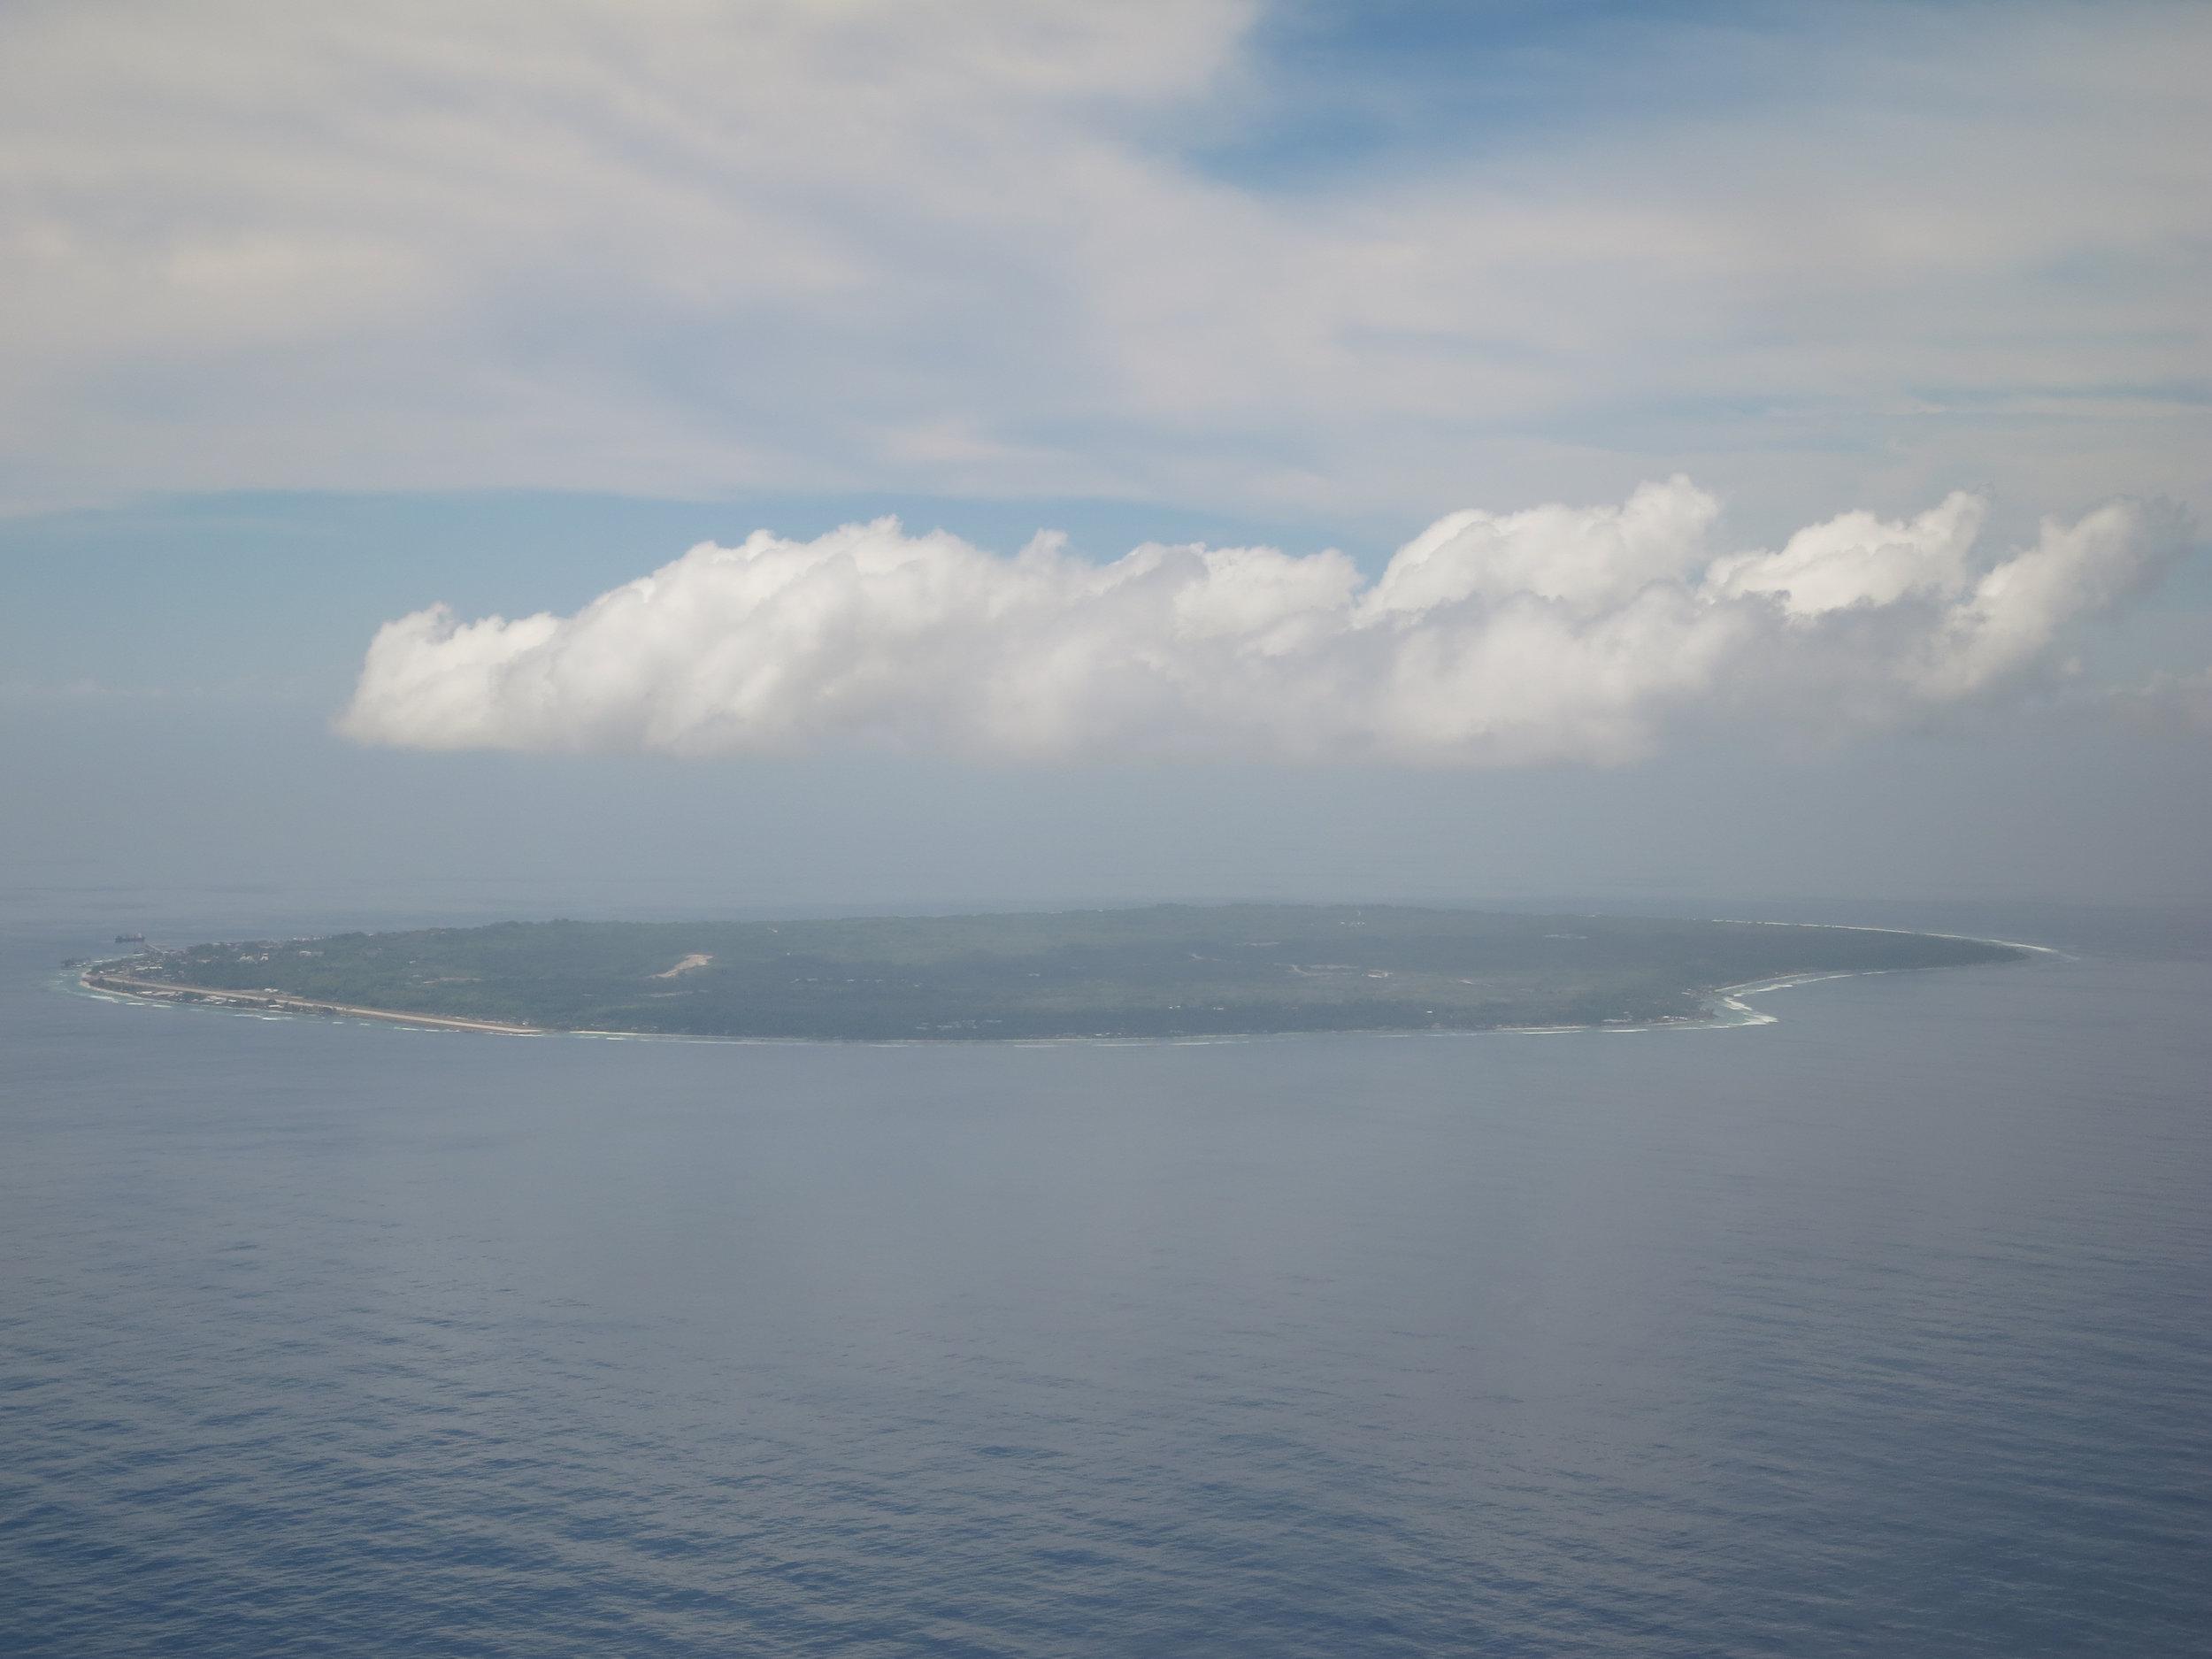 The Republic of Nauru